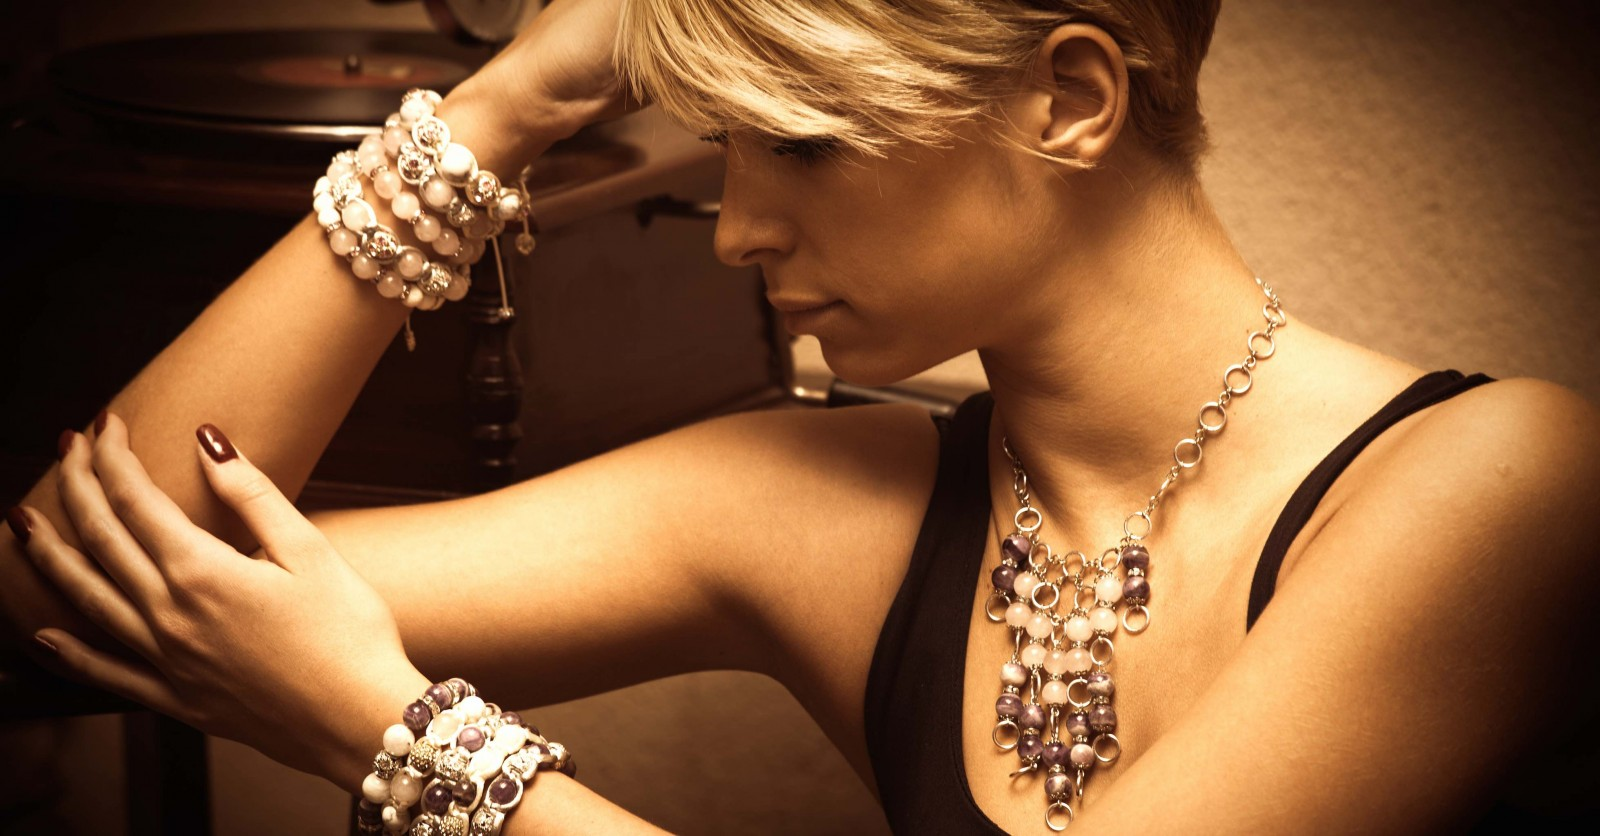 Jewelry Styling According to Your Wardrobe Personality - Style Folio Jewelry